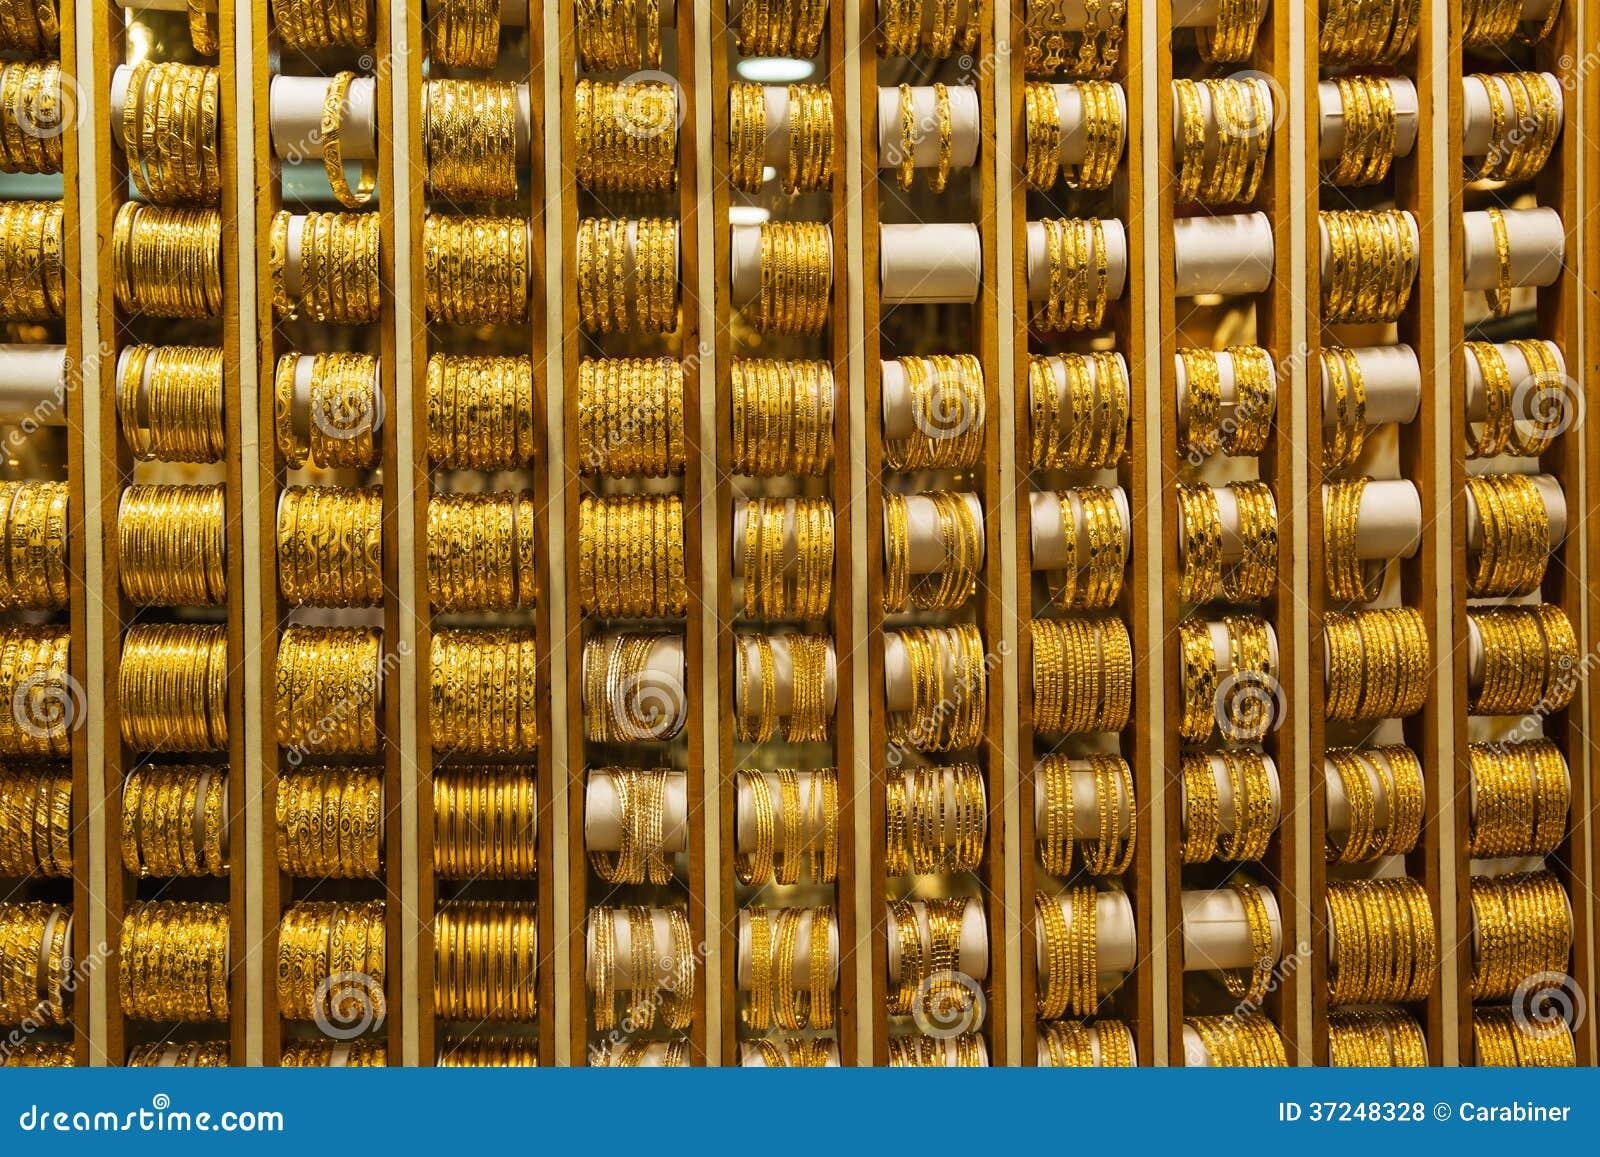 Gold Market In Dubai Royalty Free Stock Photos Image